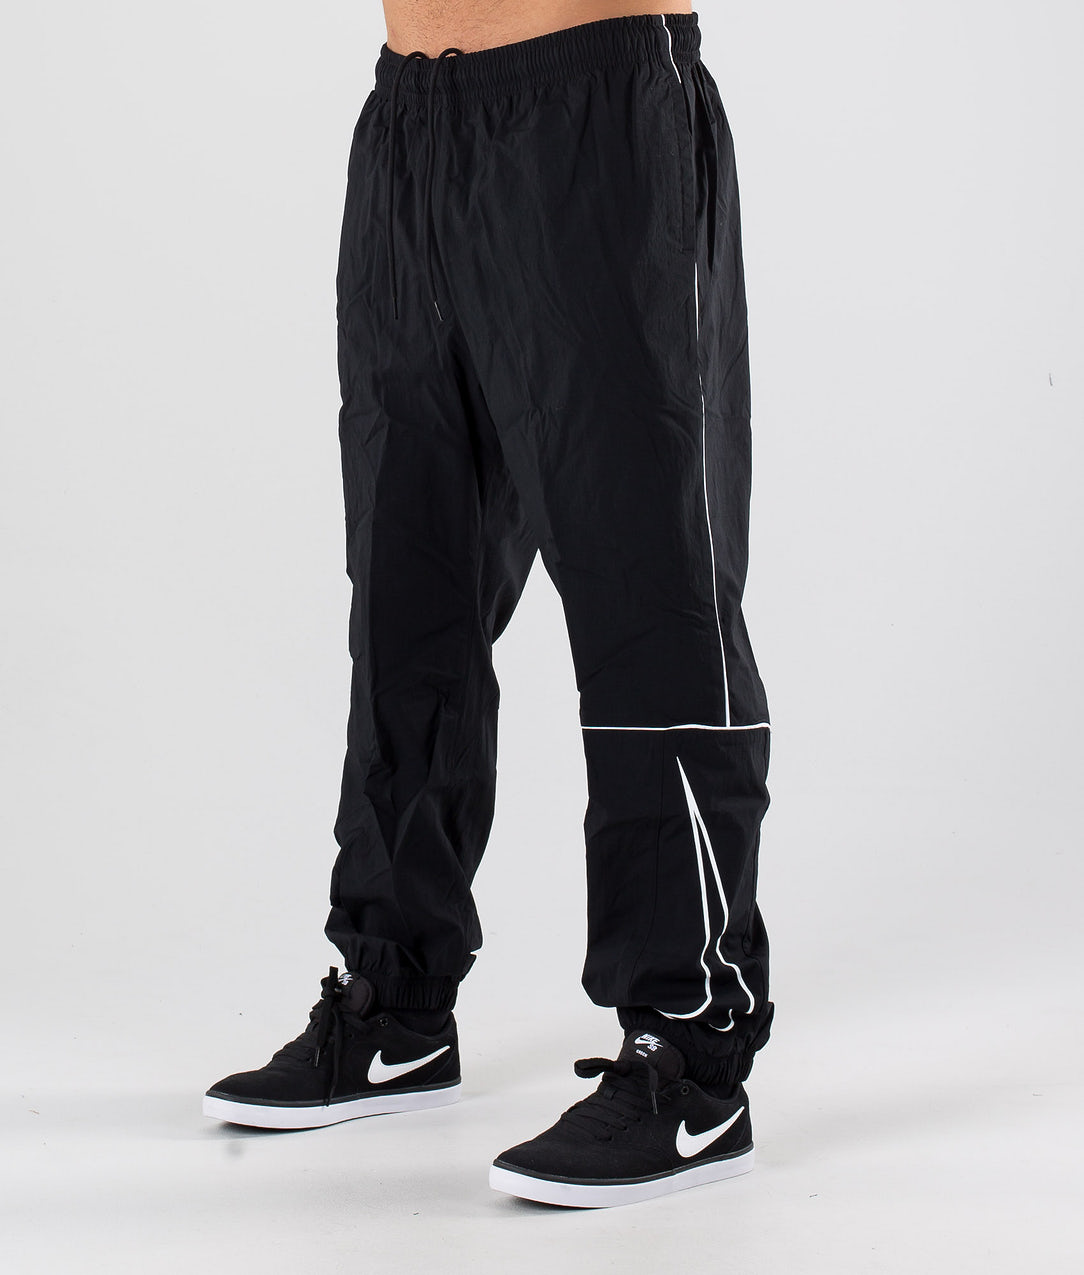 patata Conversacional Playa  Nike SB Pant Track Swoosh Pants Black/White/White - Ridestore.com